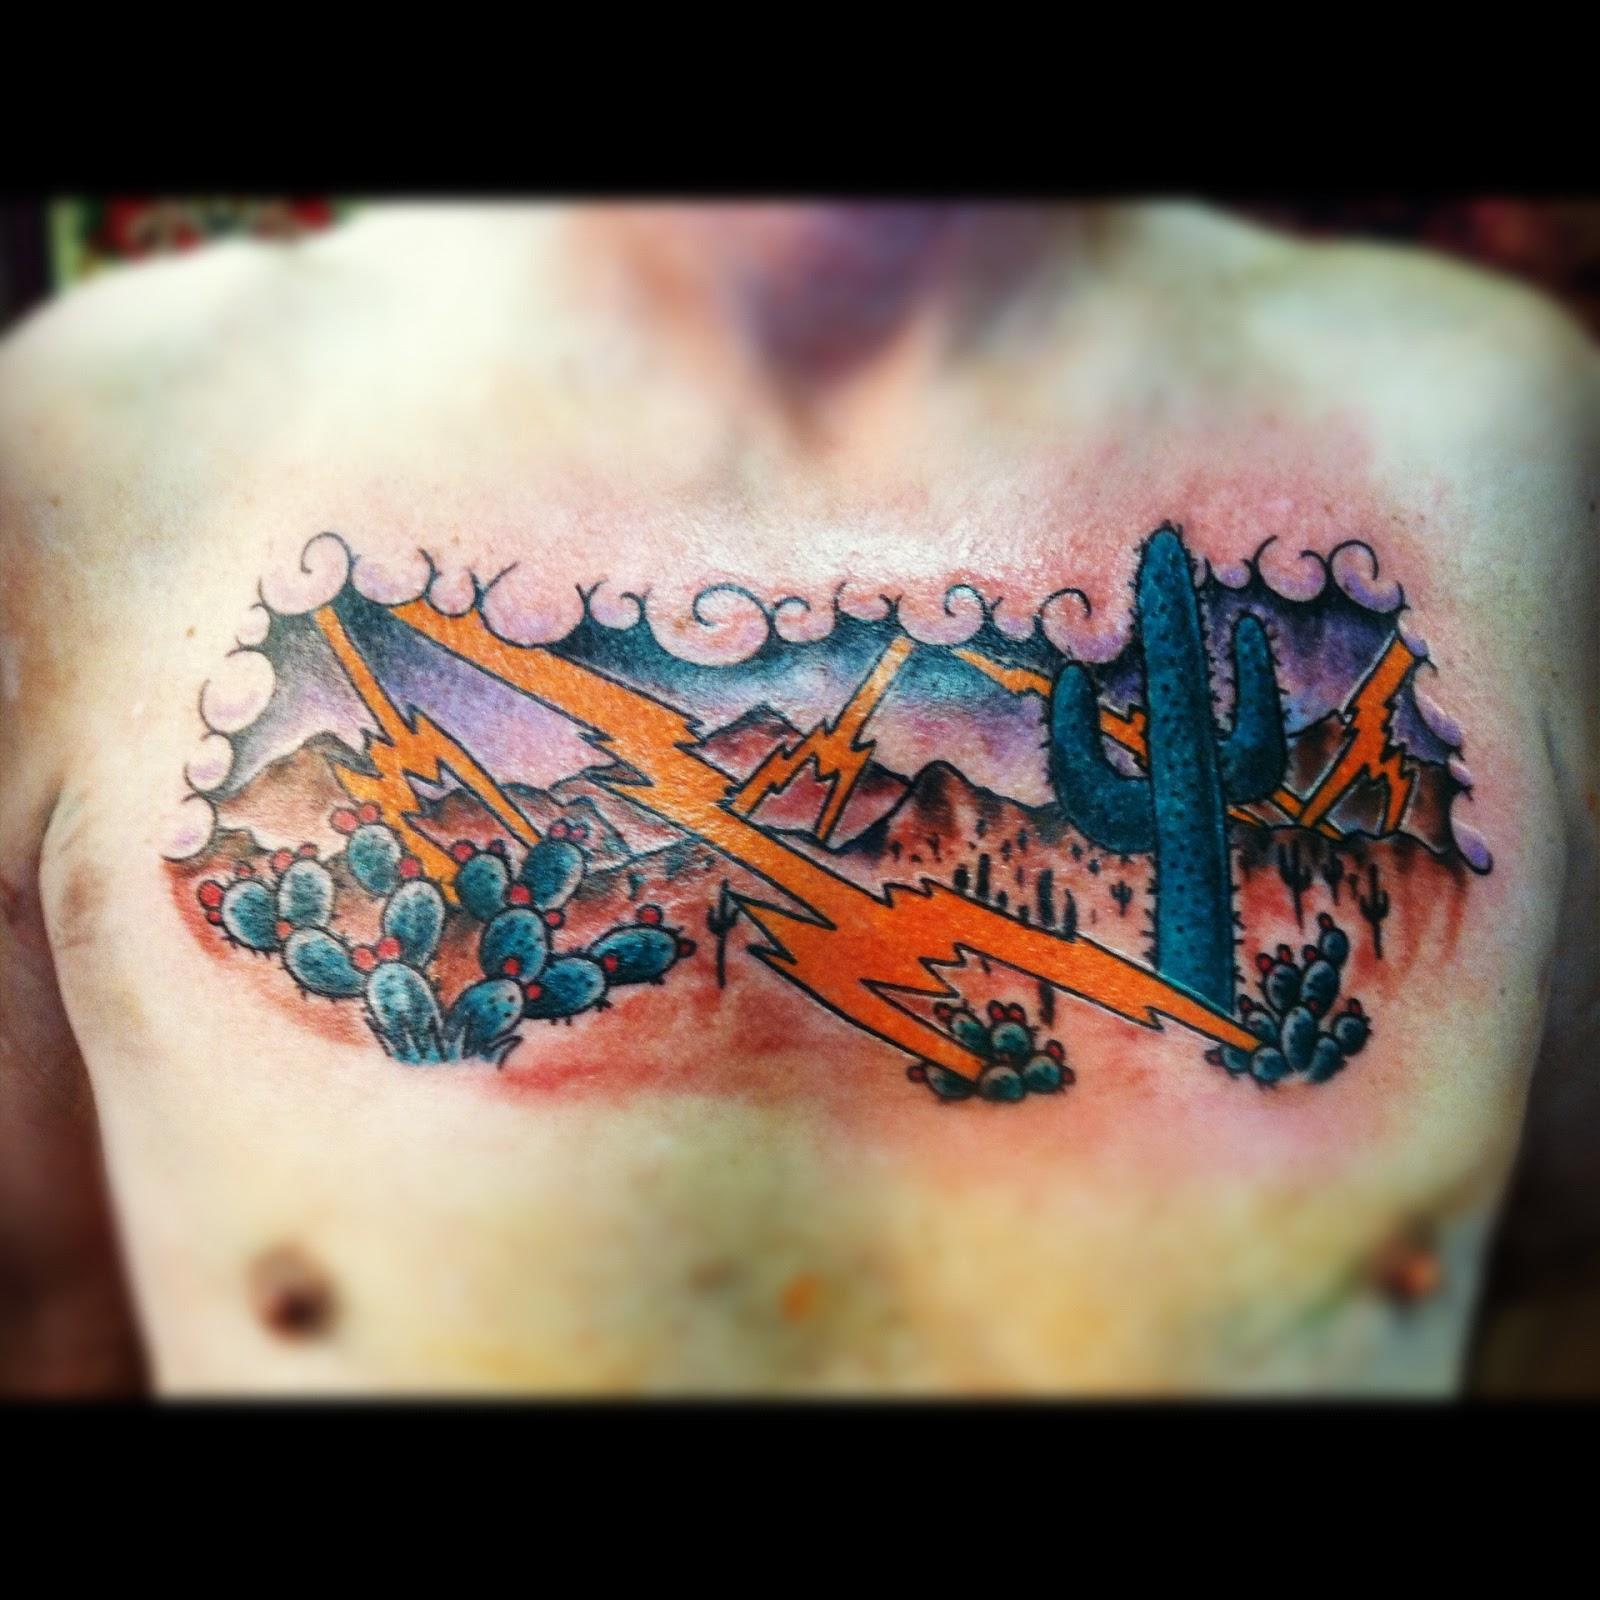 049421d690cc0 Tucson Arizona Monsoon Traditional Color Chest Custom Tattoo By David Meek  Tattoos at Fast Lane Tattoo